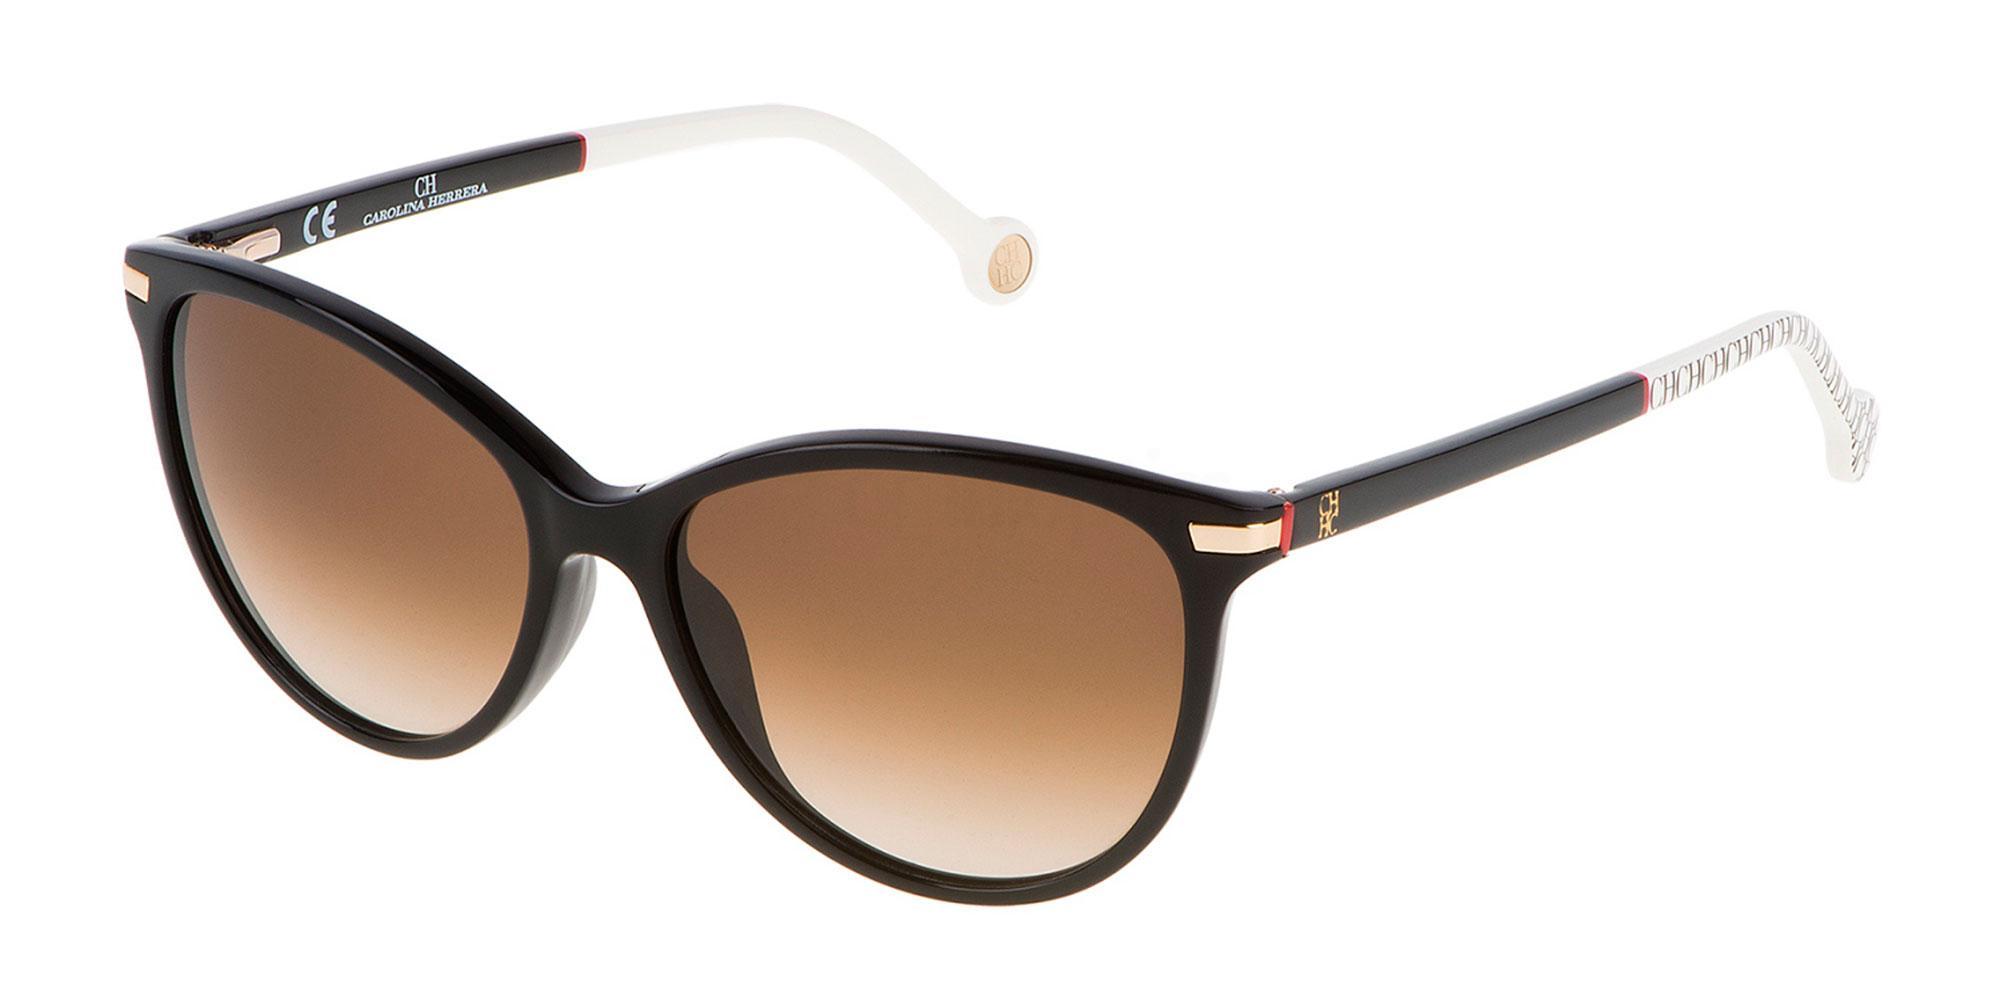 700L SHE651 Sunglasses, CH Carolina Herrera